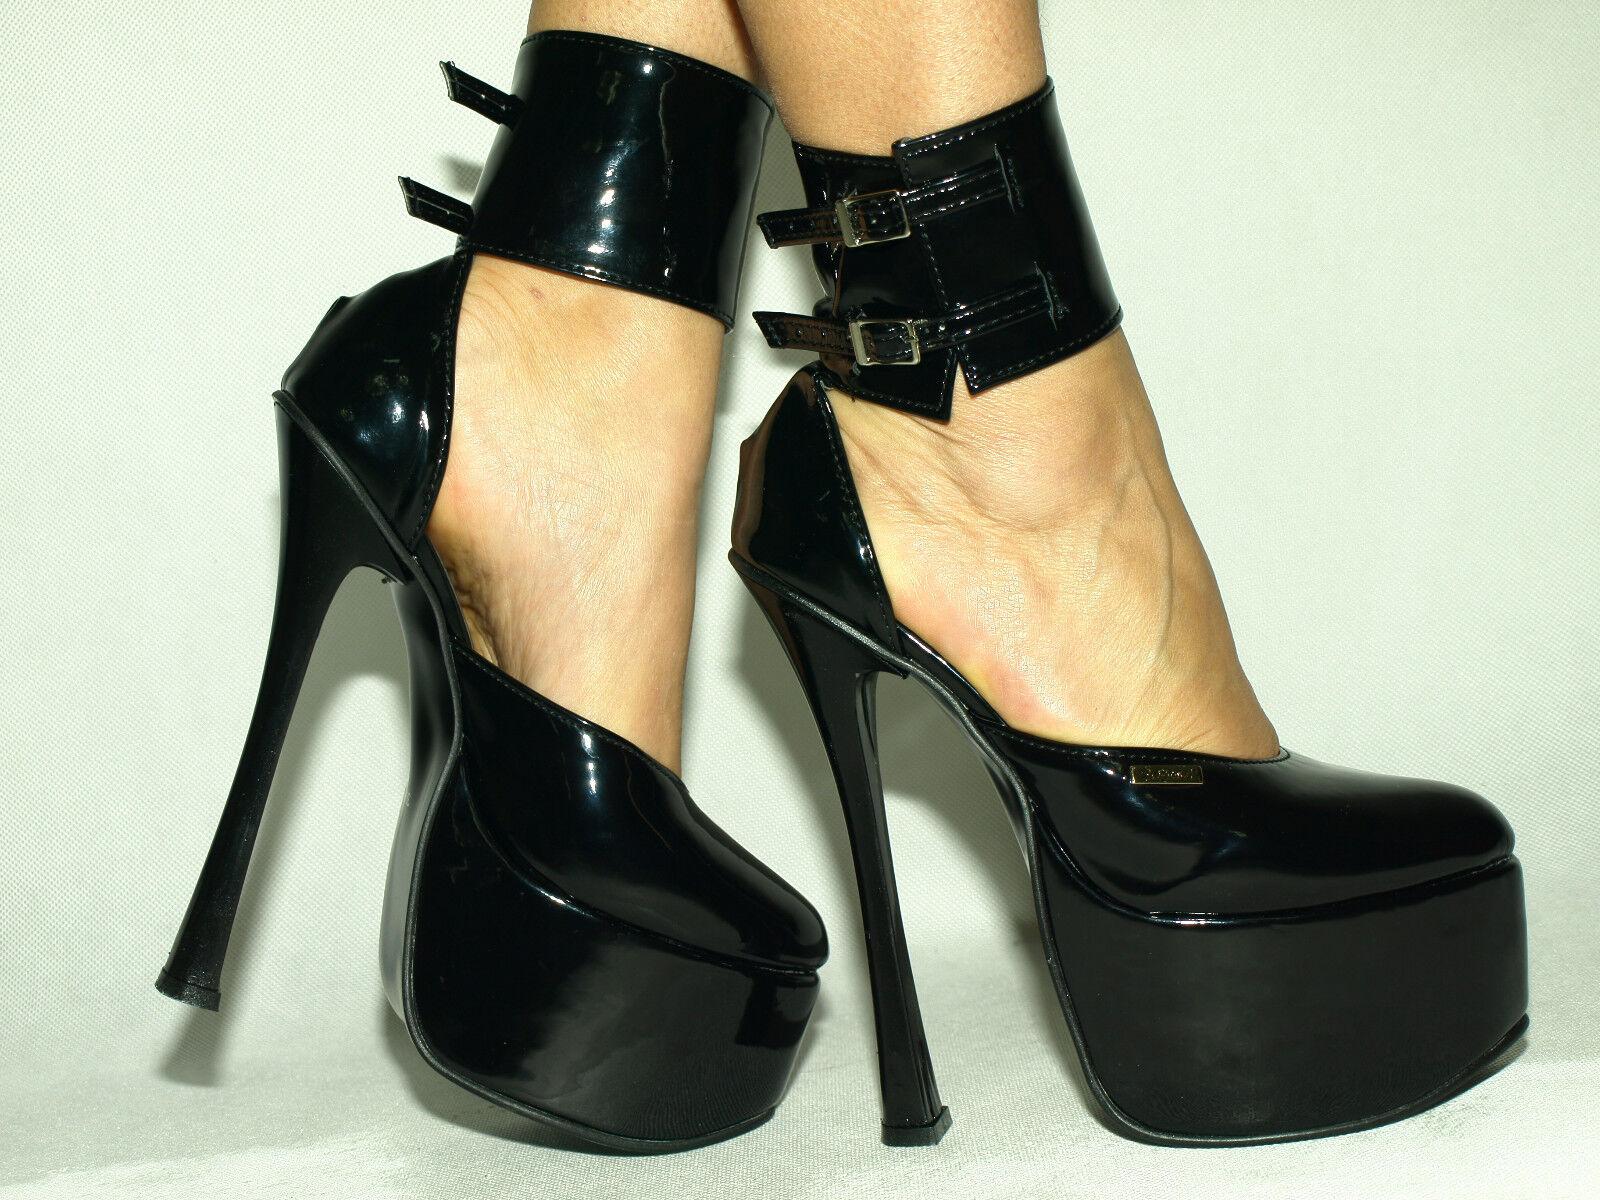 Highs Heels 20cm lack pu 37 38 39 40 41 42 43 44 45 46 47 Bolingier-Poland 1455